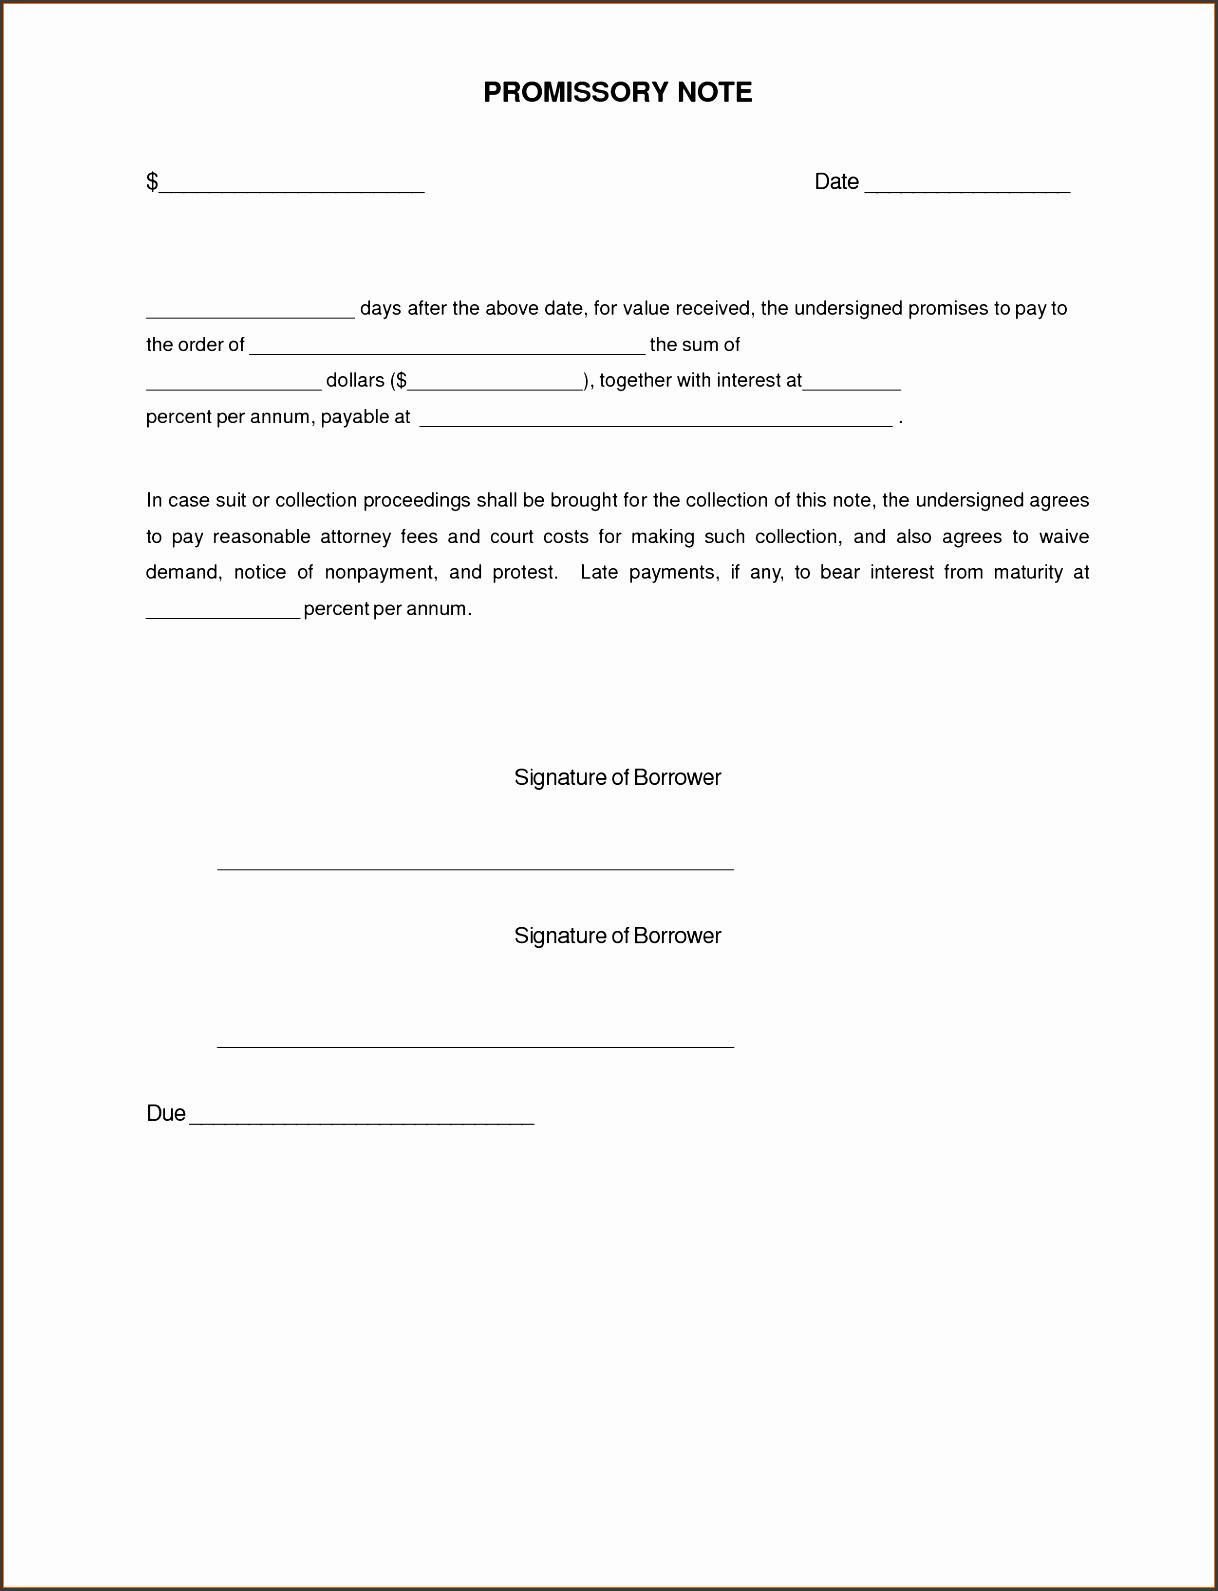 promissory note format india sample promissory note word templates promissory note template promissory note format